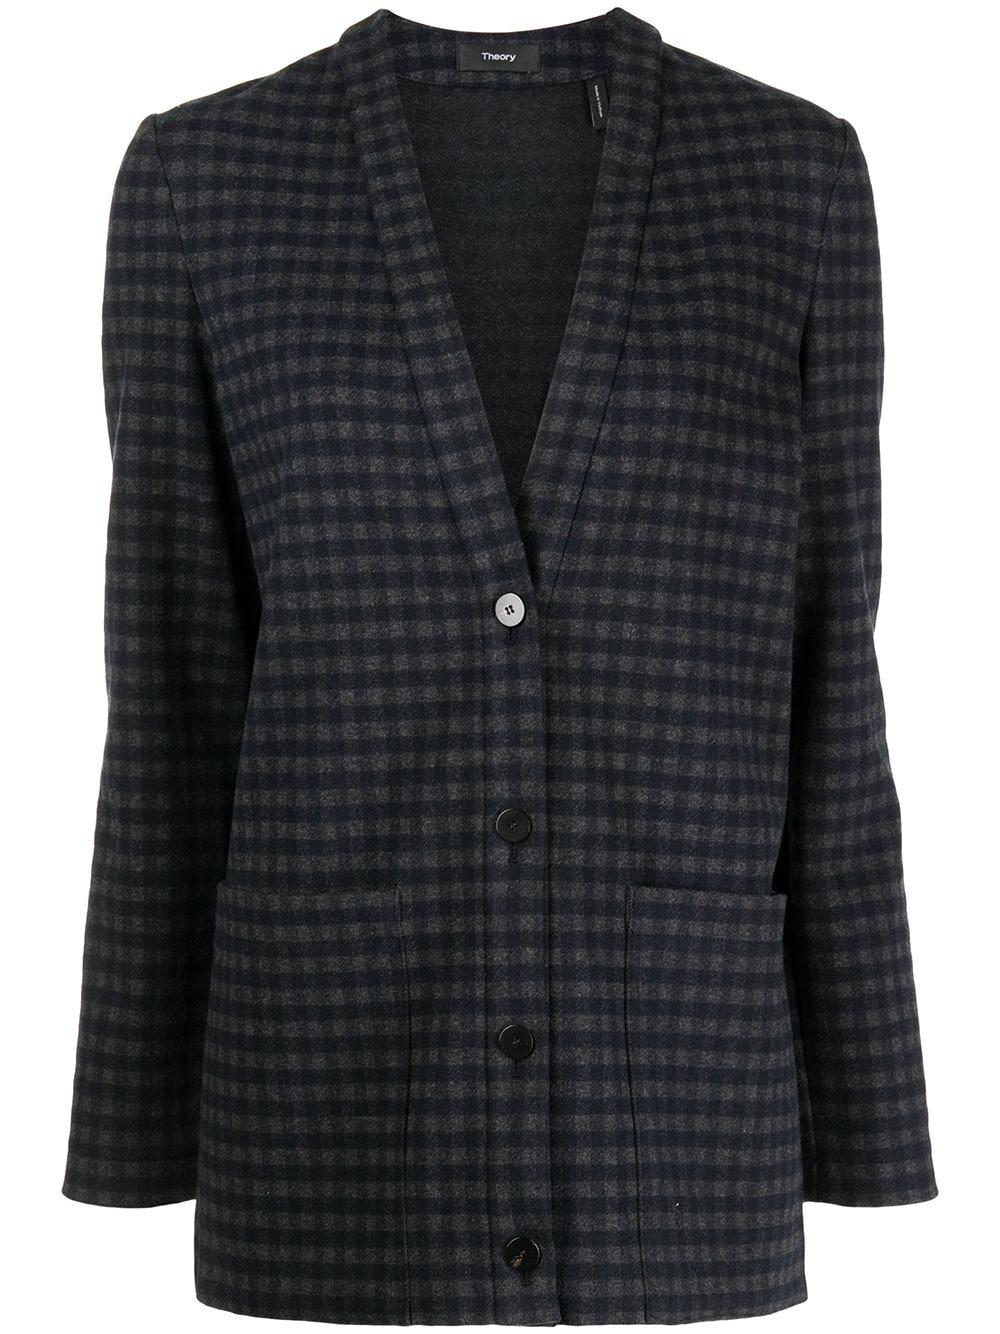 Checked Cardigan Blazer Item # L0825111